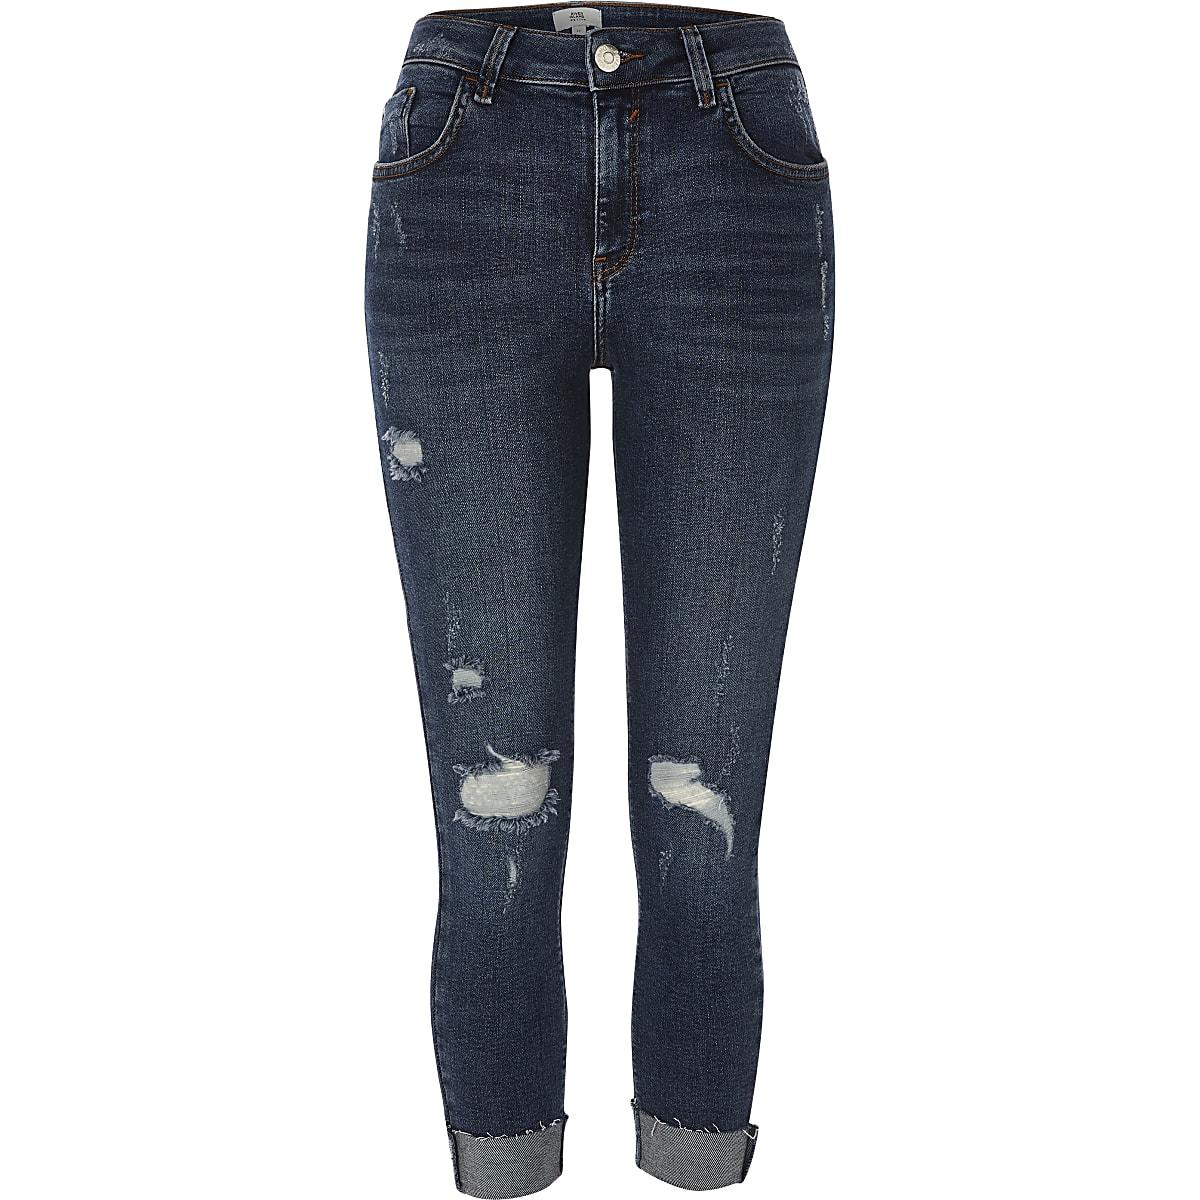 RI Petite - Amelie - Blauwe superskinny ripped jeans